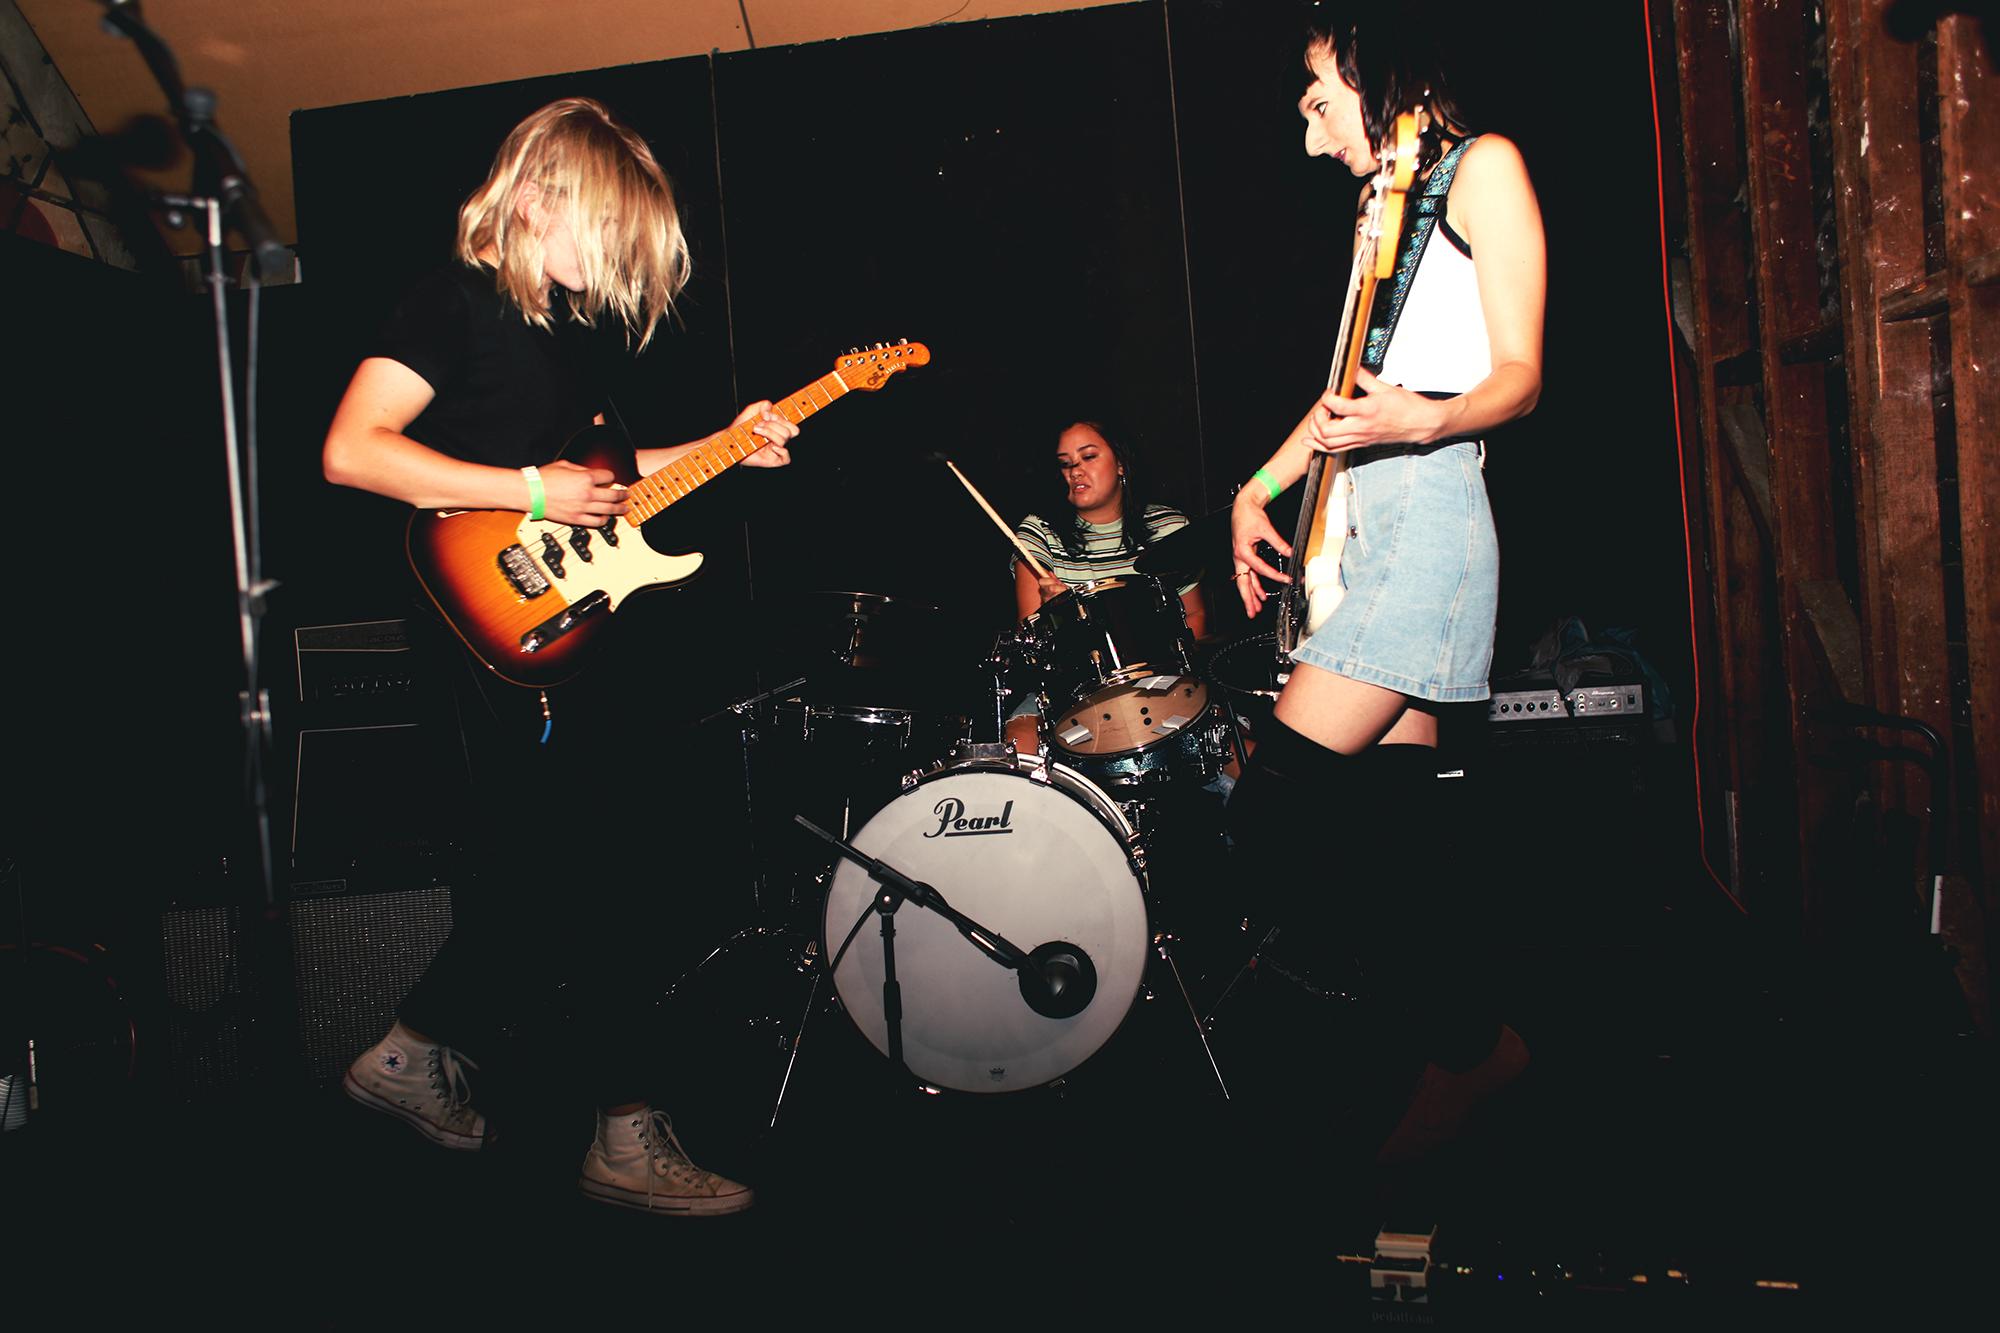 Liv Slingerland - Guitar/Vox | Genna Projansky - Bass/Background Vox | India Pascucci - Drums  Live at The Lost Room for Echo Park Rising 2017  Photo by Shabnam Ferdowsi for Buzzbands LA